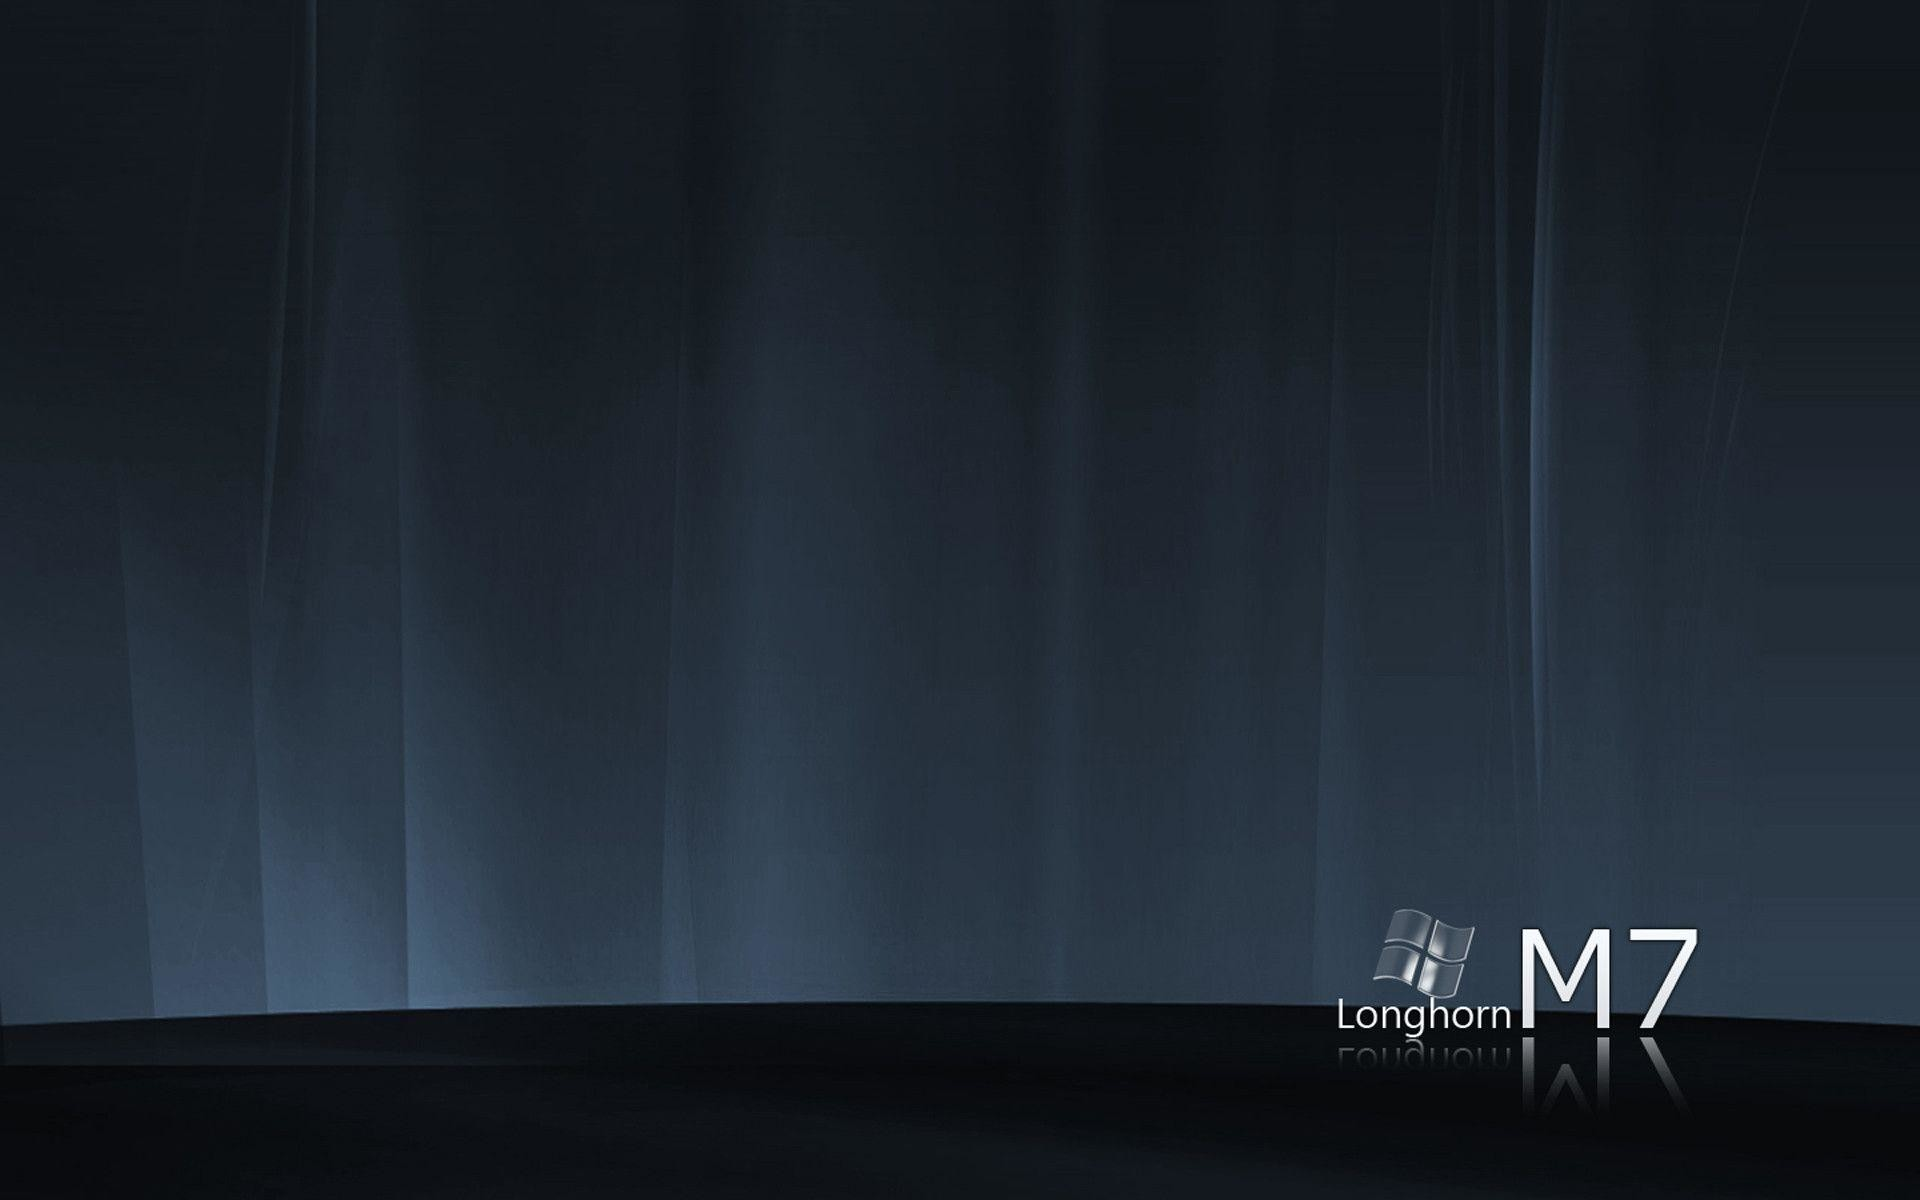 2 Microsoft Longhorn Wallpapers | Microsoft Longhorn Backgrounds